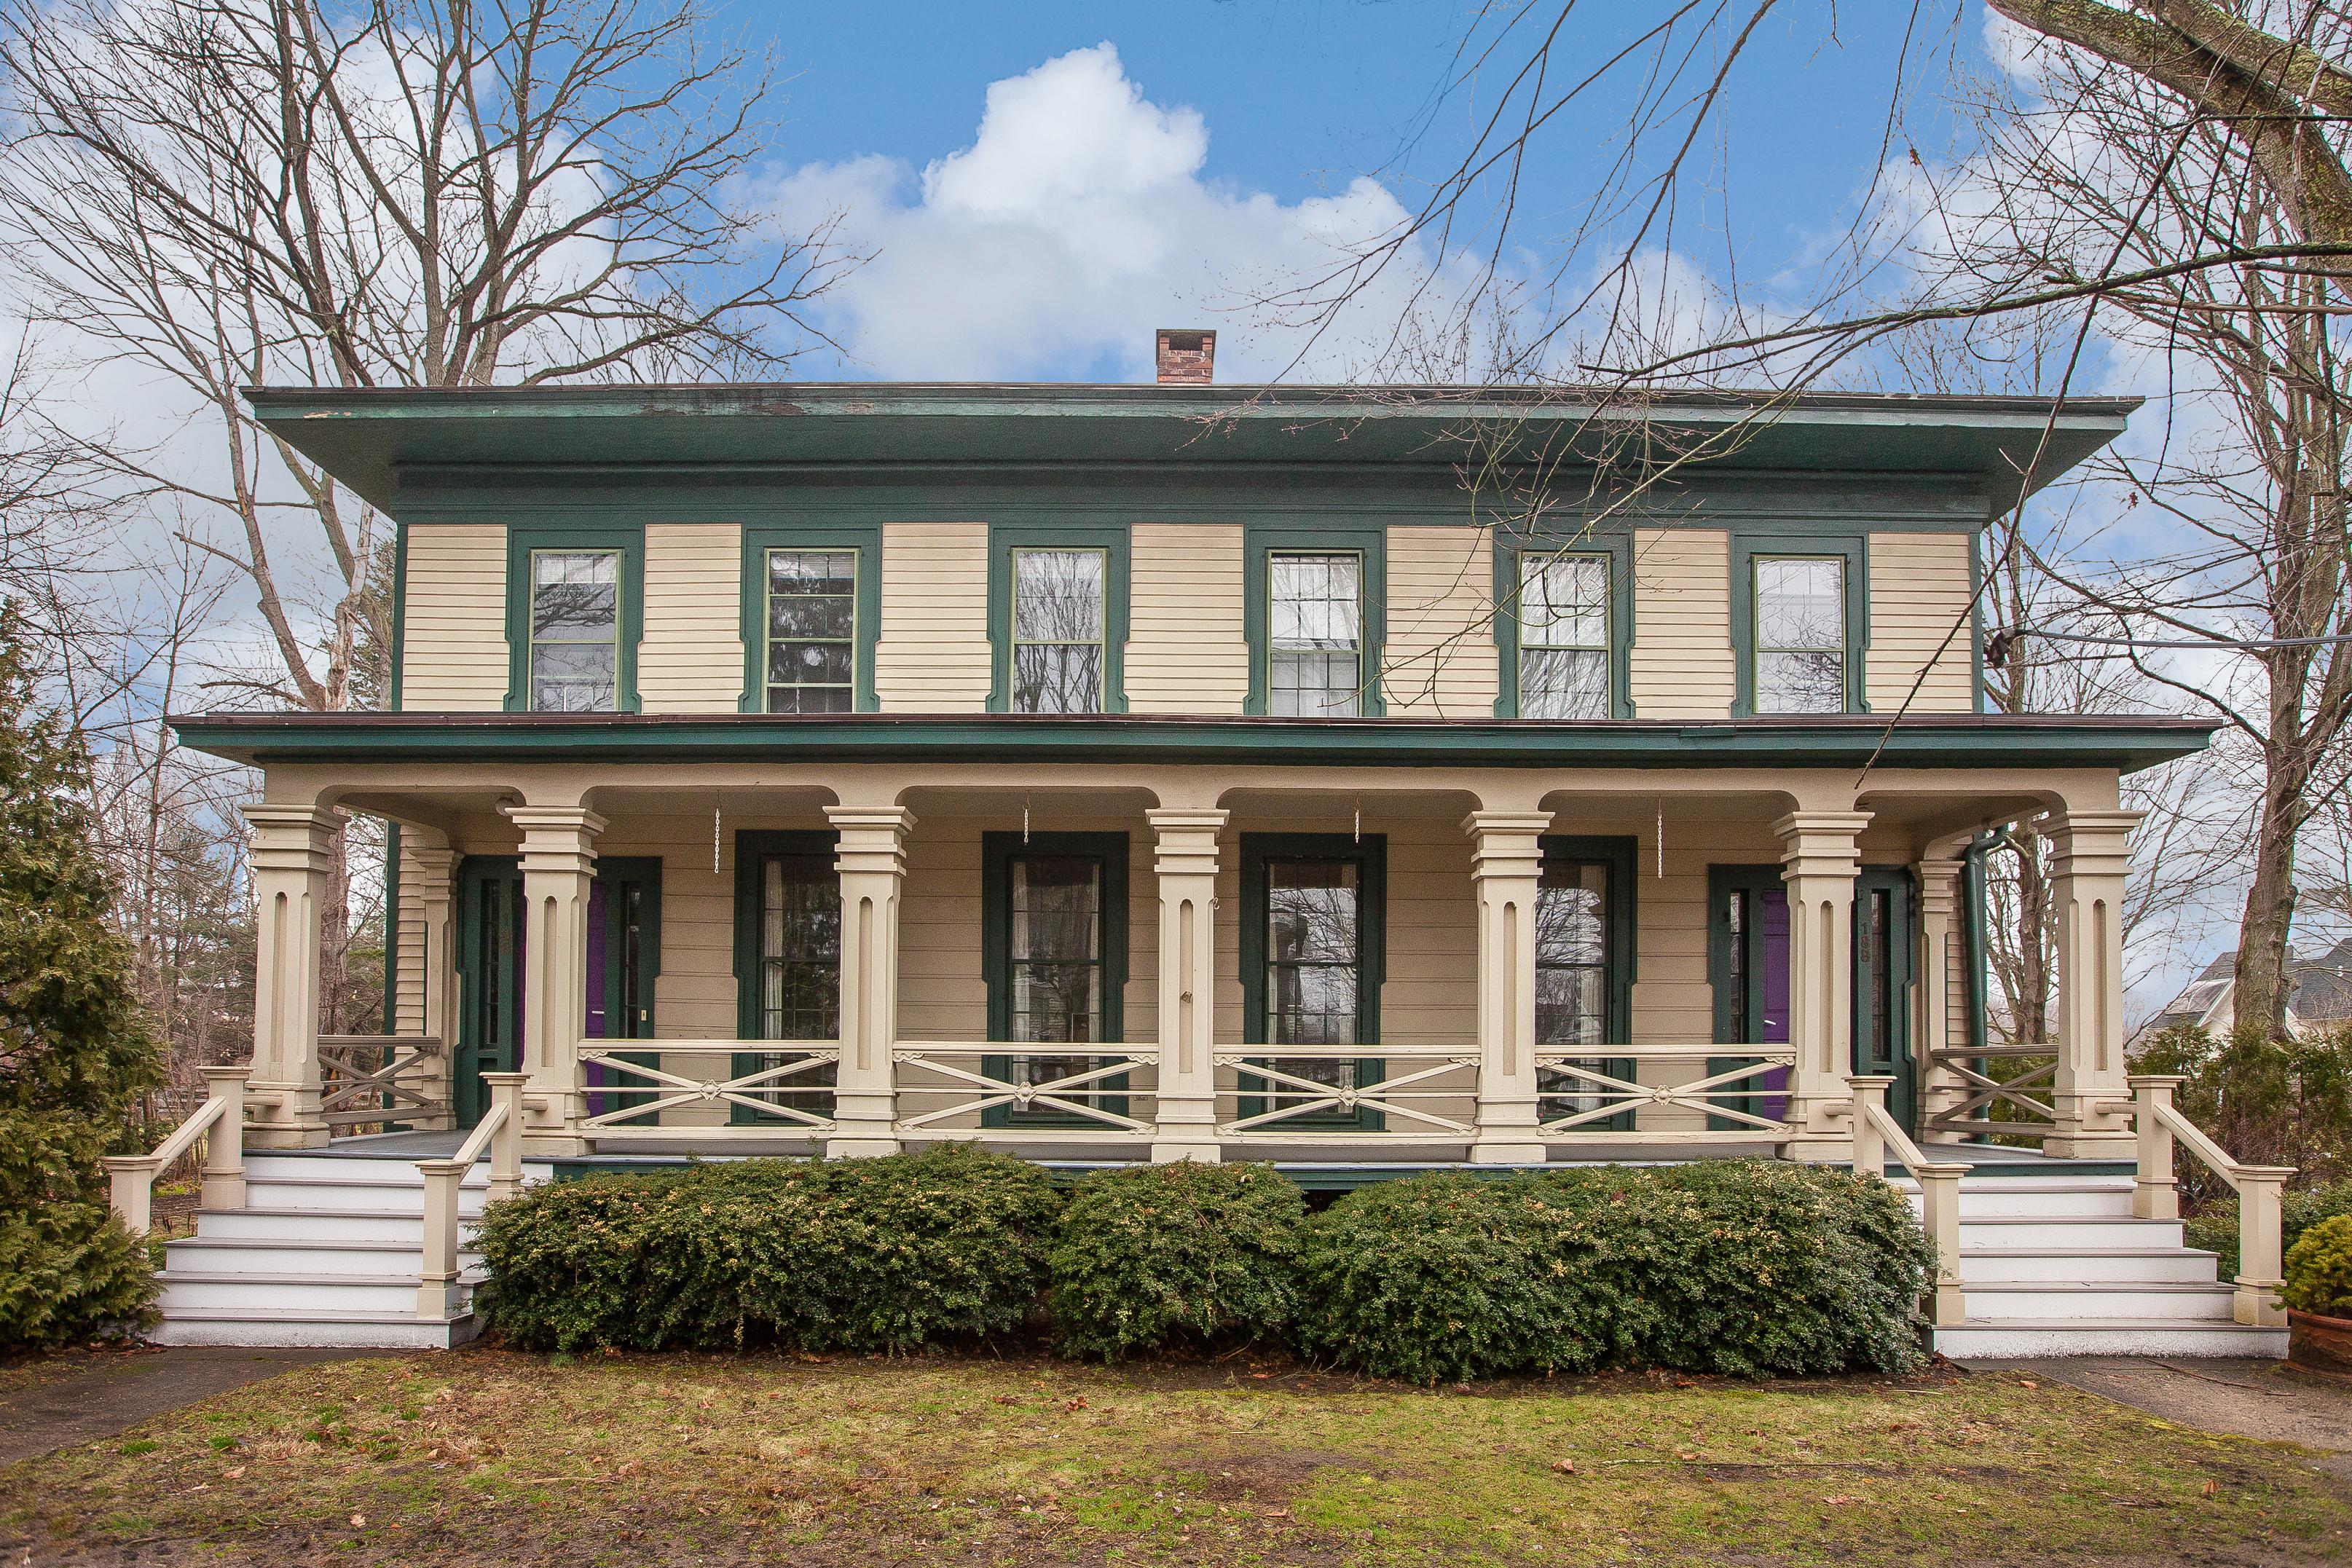 Casa Unifamiliar por un Venta en 188 Whitfield St Guilford, Connecticut 06437 Estados Unidos